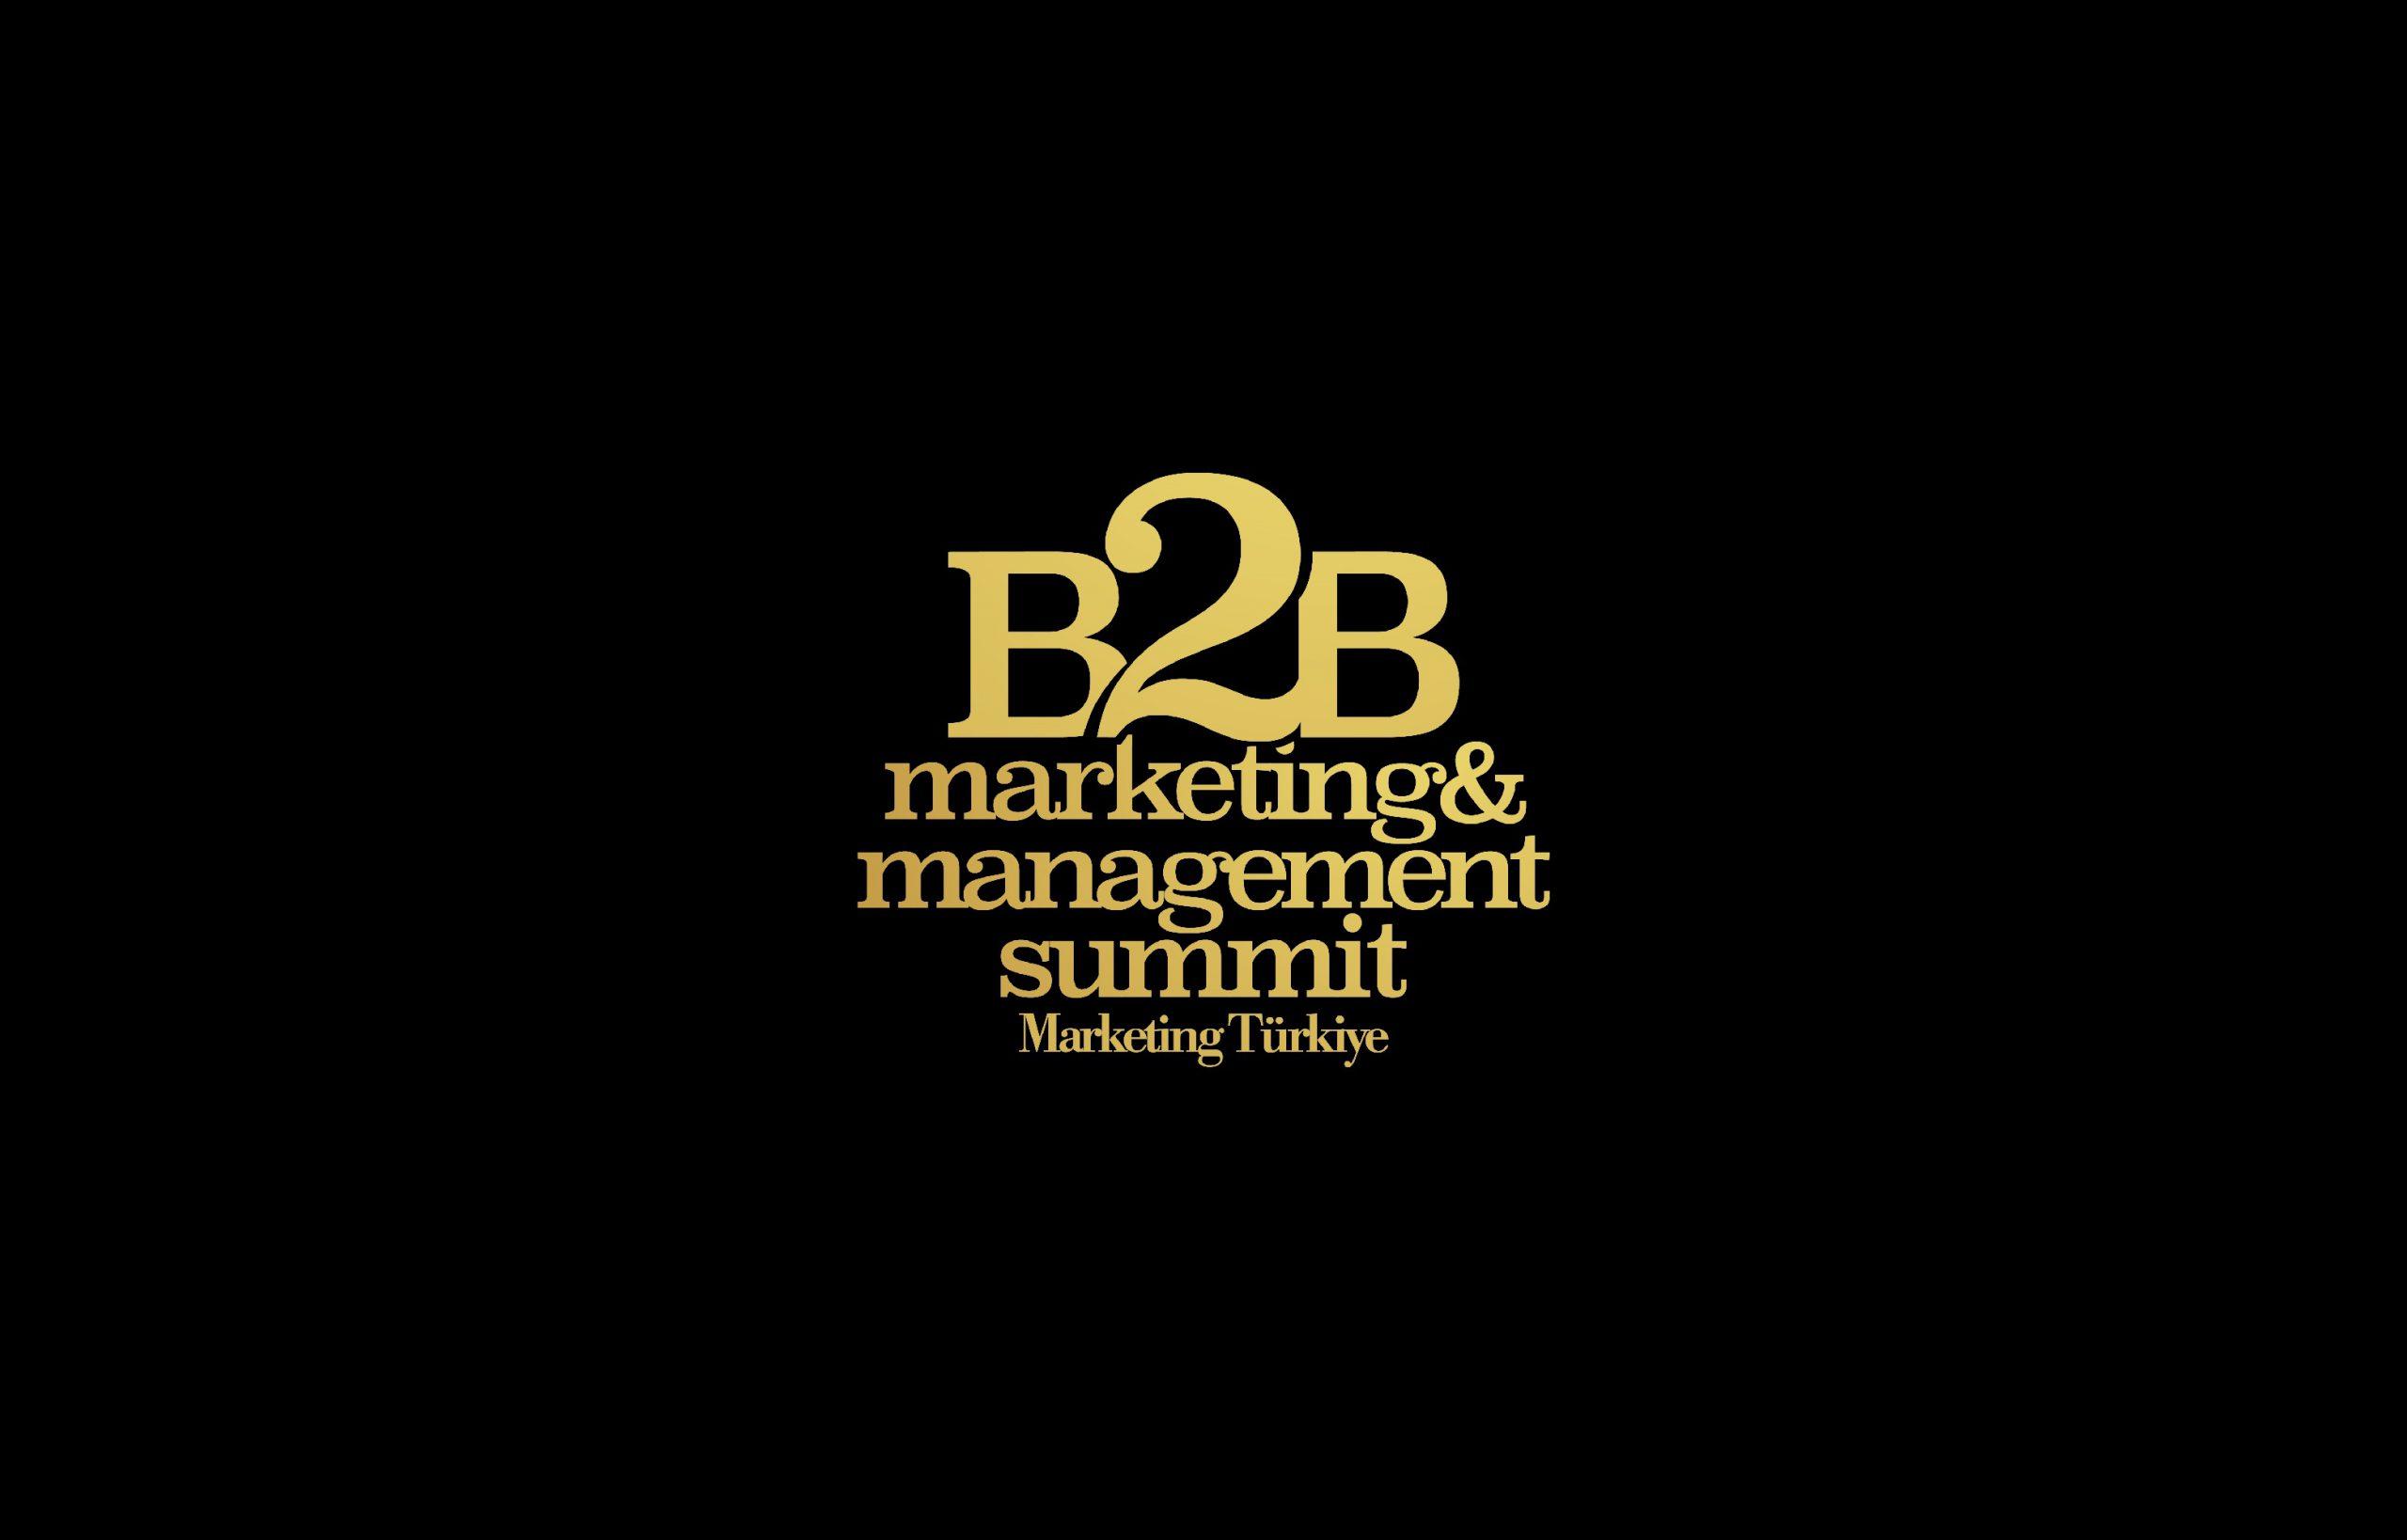 B2B Marketing & Management Summit tüm hızıyla devam...